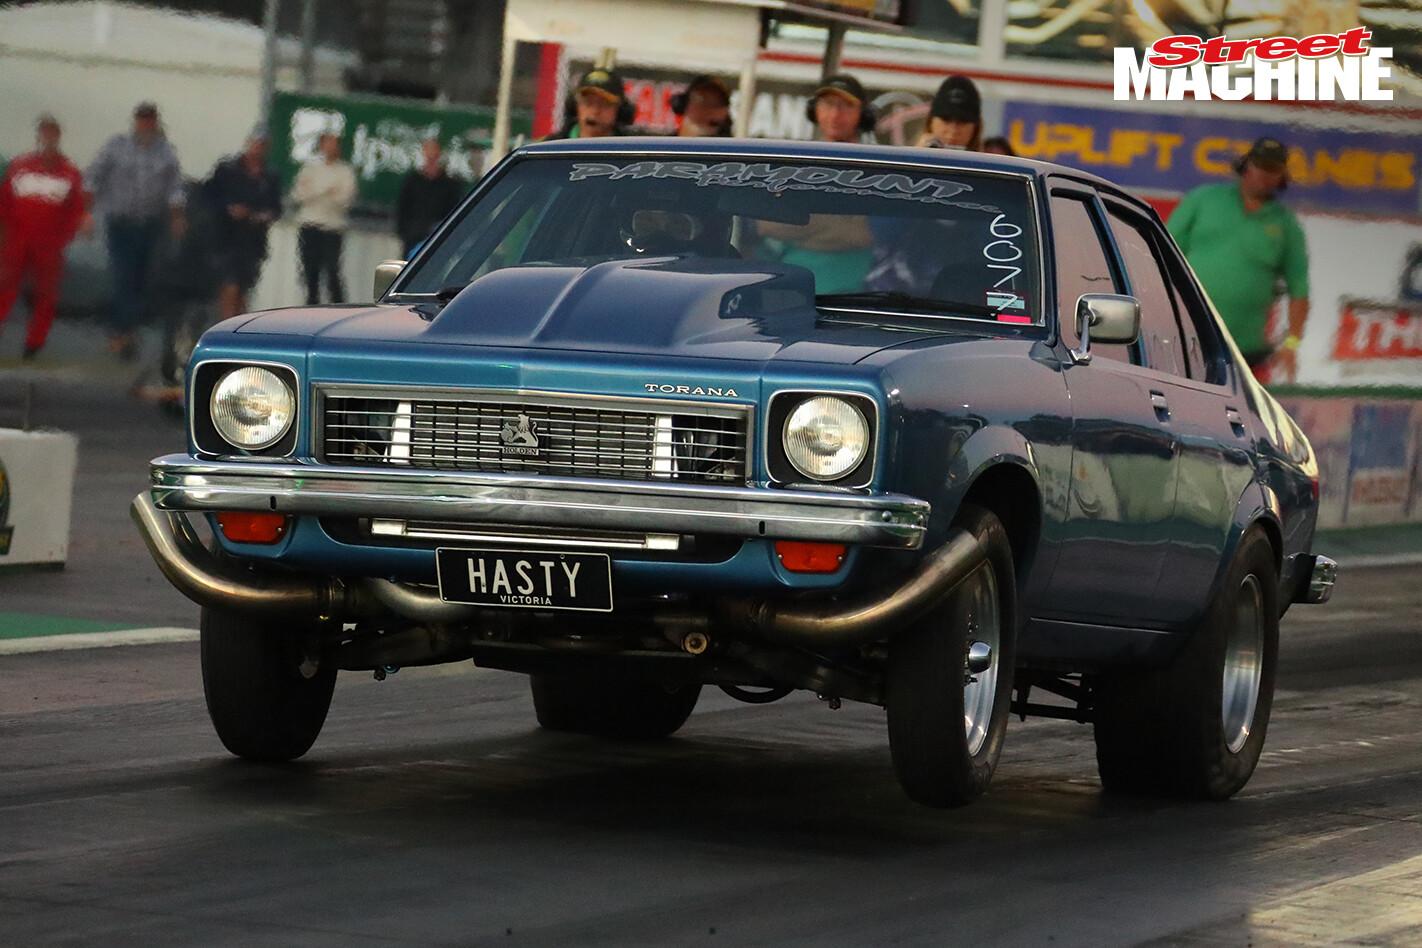 Holden LH Torana Turbo HASTY